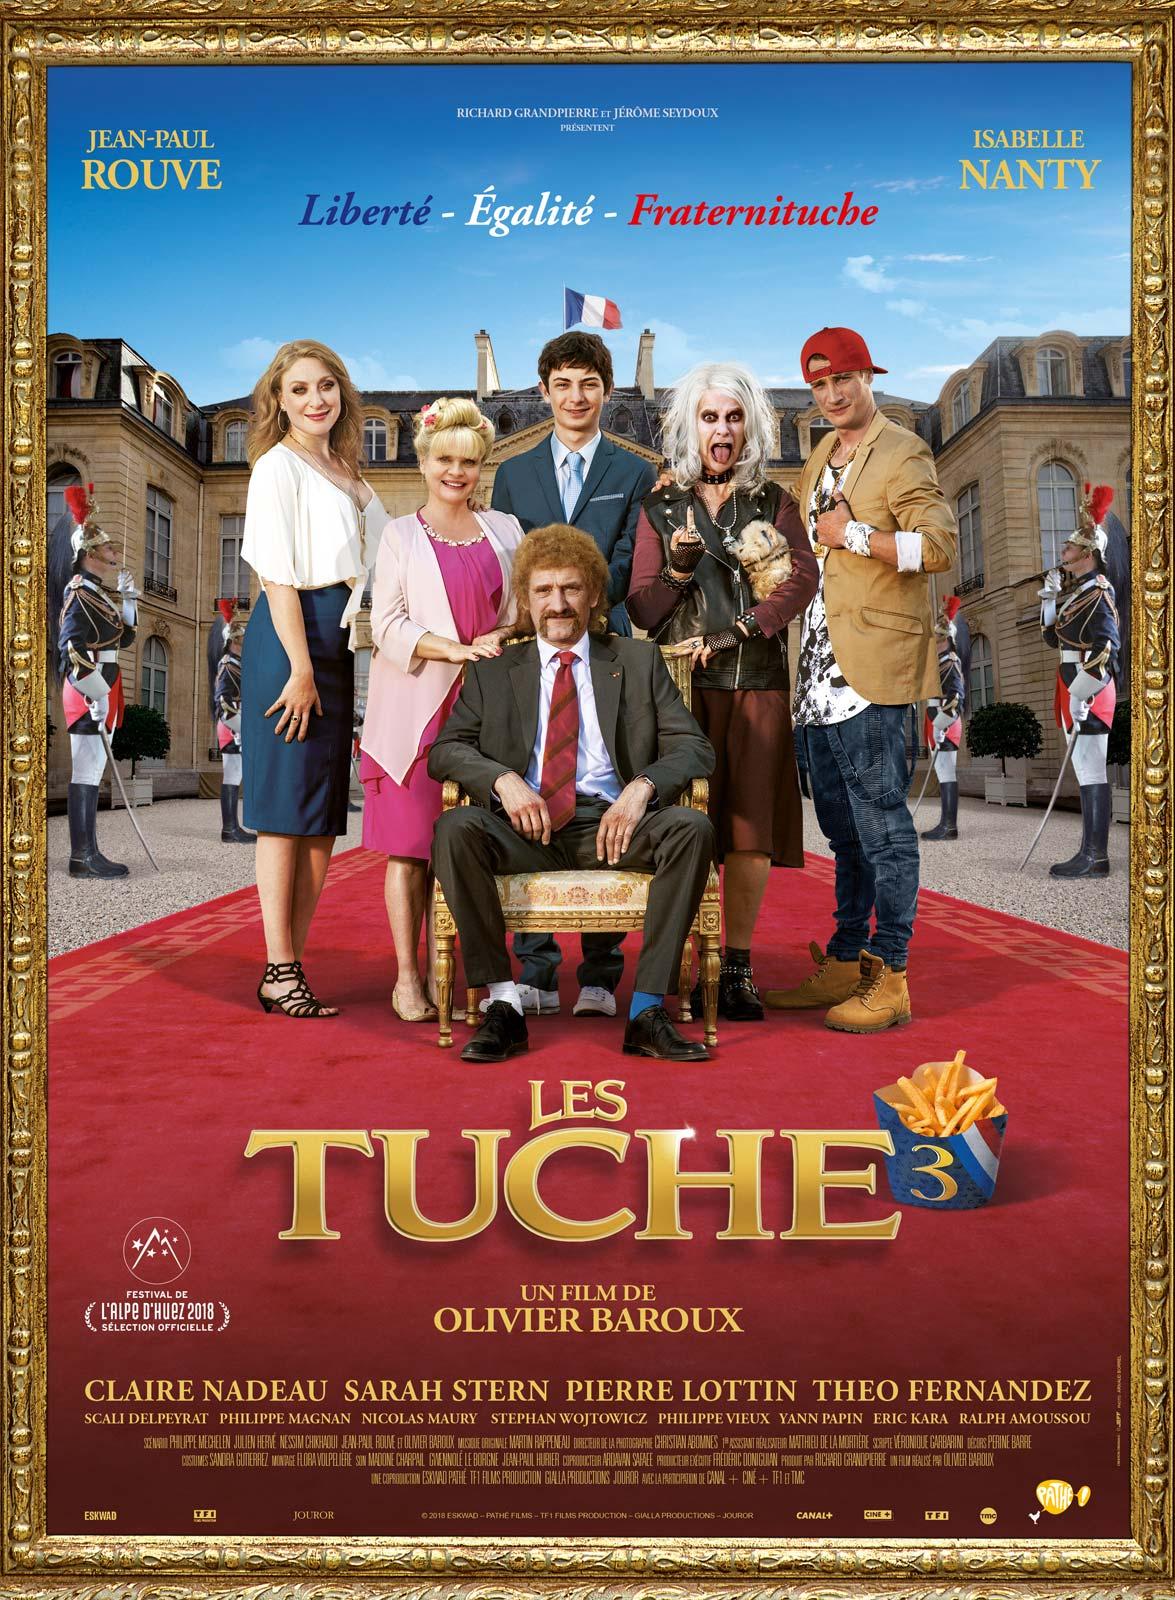 Les Tuches 3 Streaming